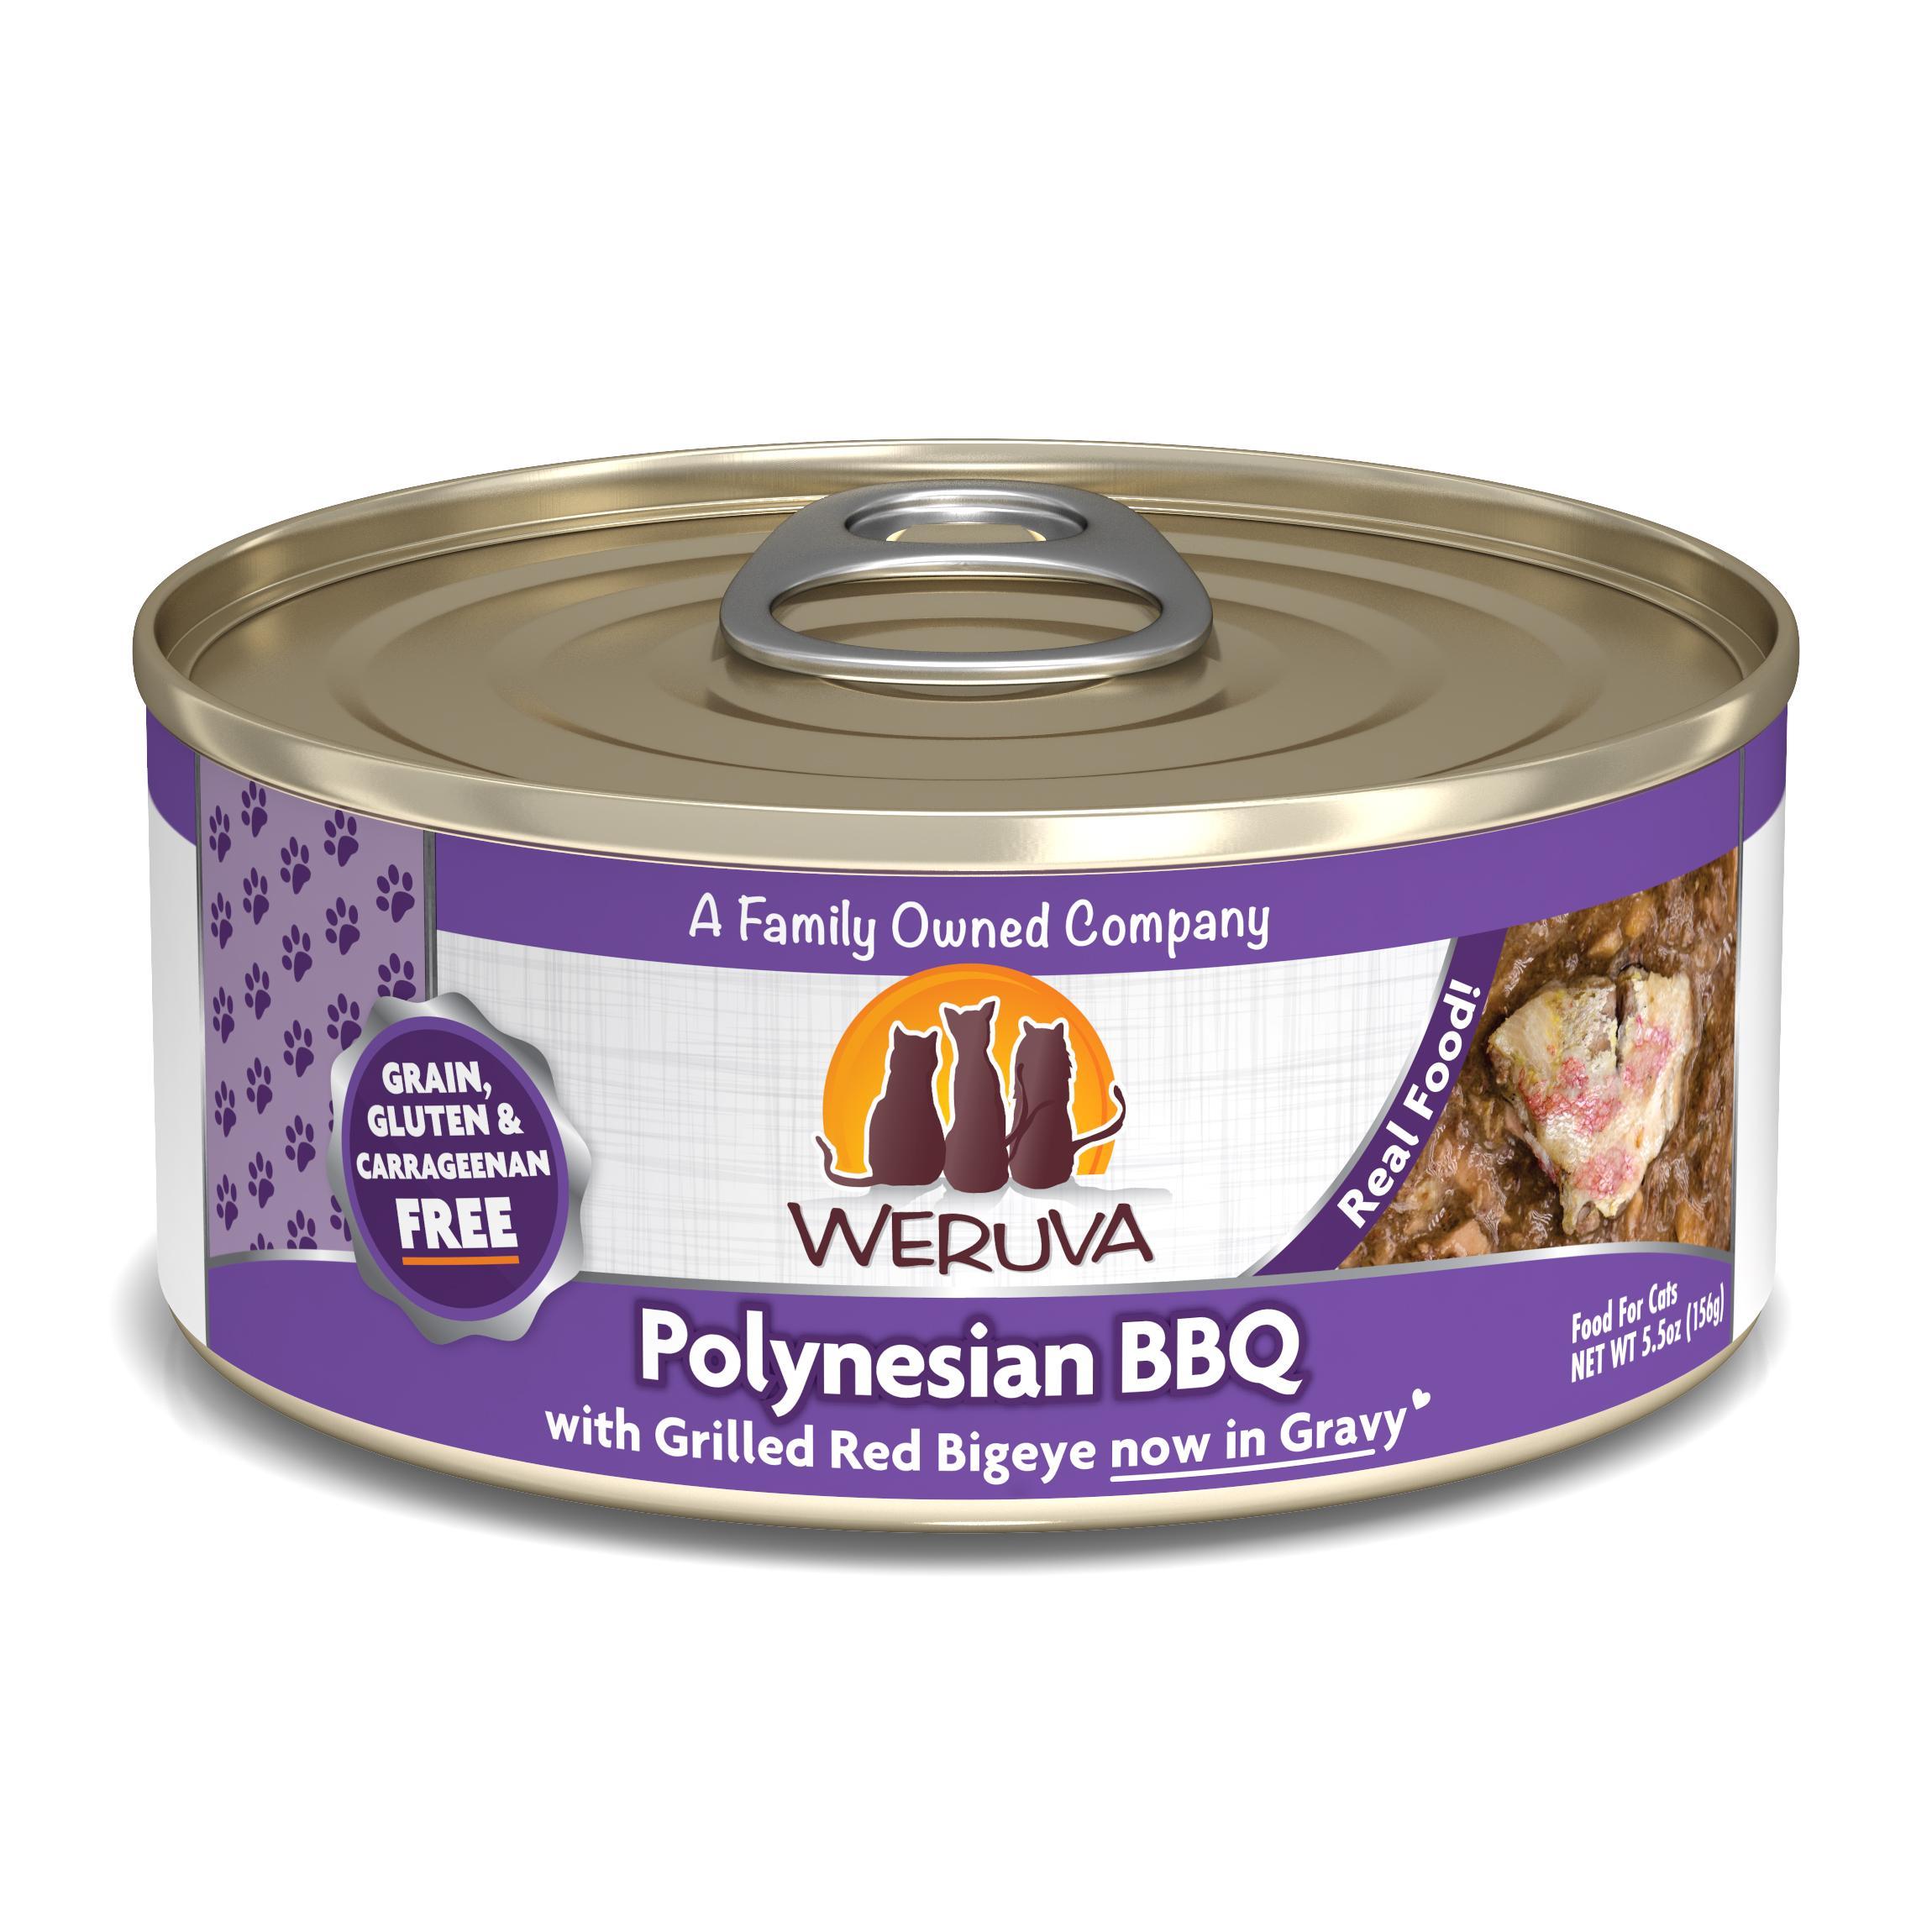 Weruva Cat Classic Polynesian BBQ with Grilled Red Bigeye Grain-Free Wet Cat Food, 5.5-oz